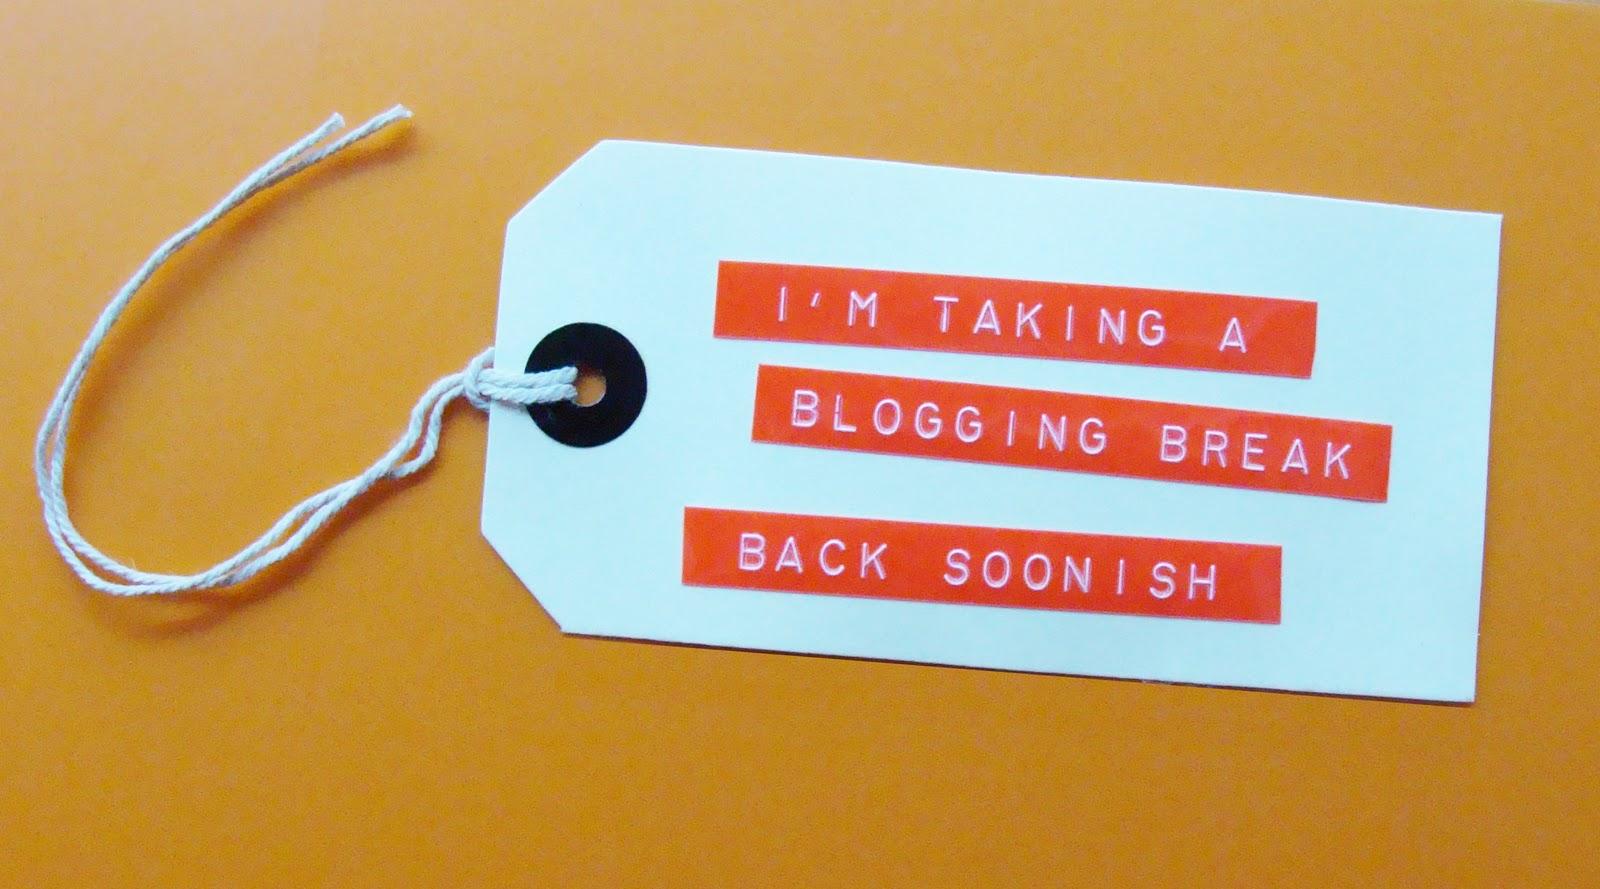 Bloggin' Break